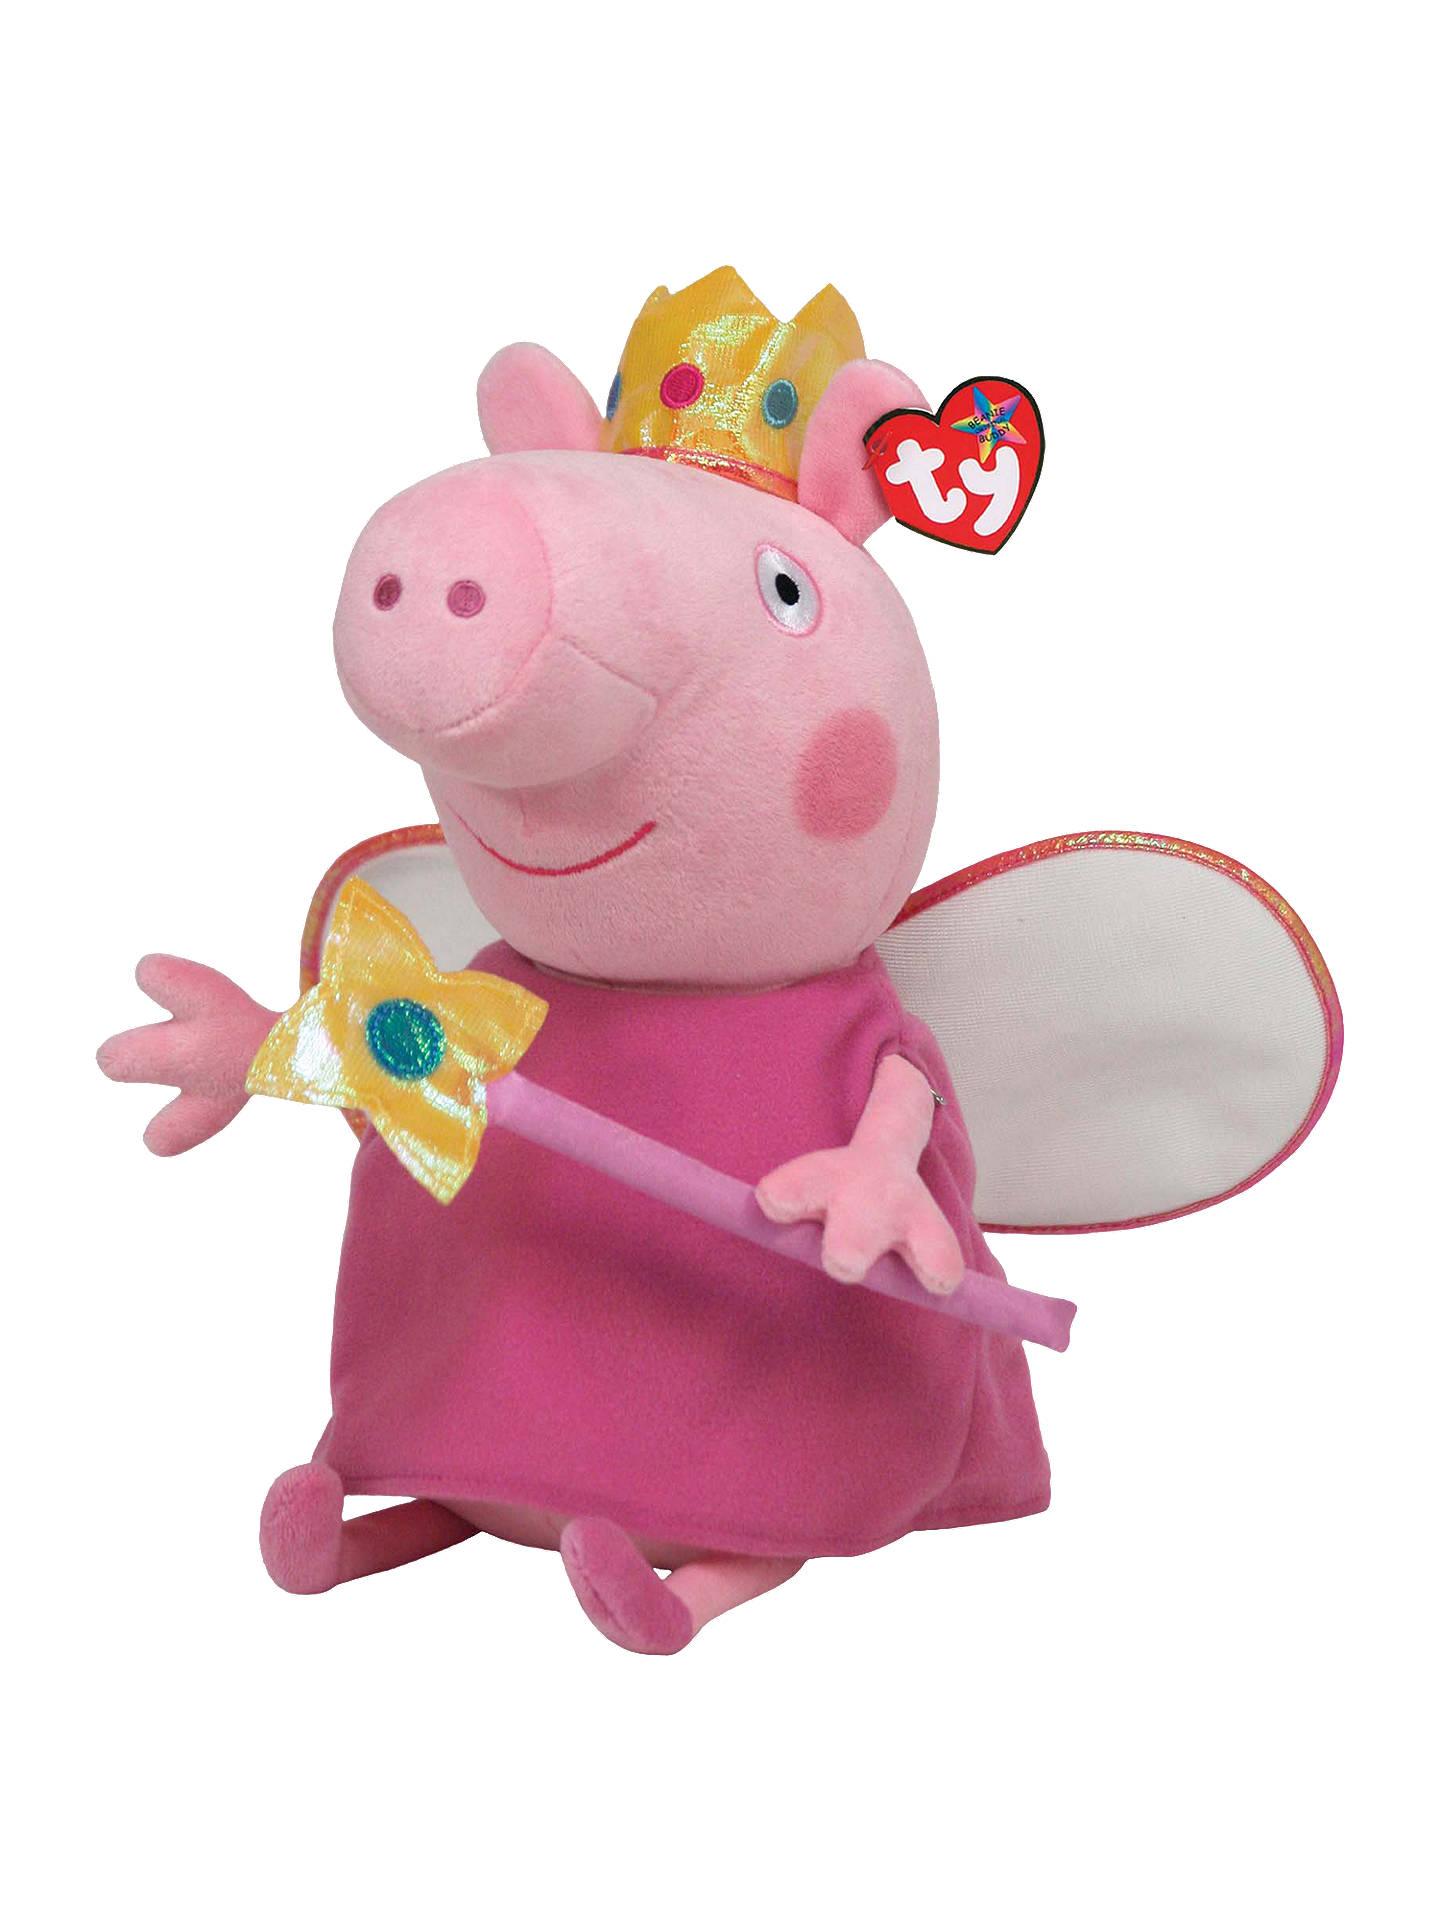 BuyTy Peppa Pig Princess Beanie Baby 18f2e9461c08